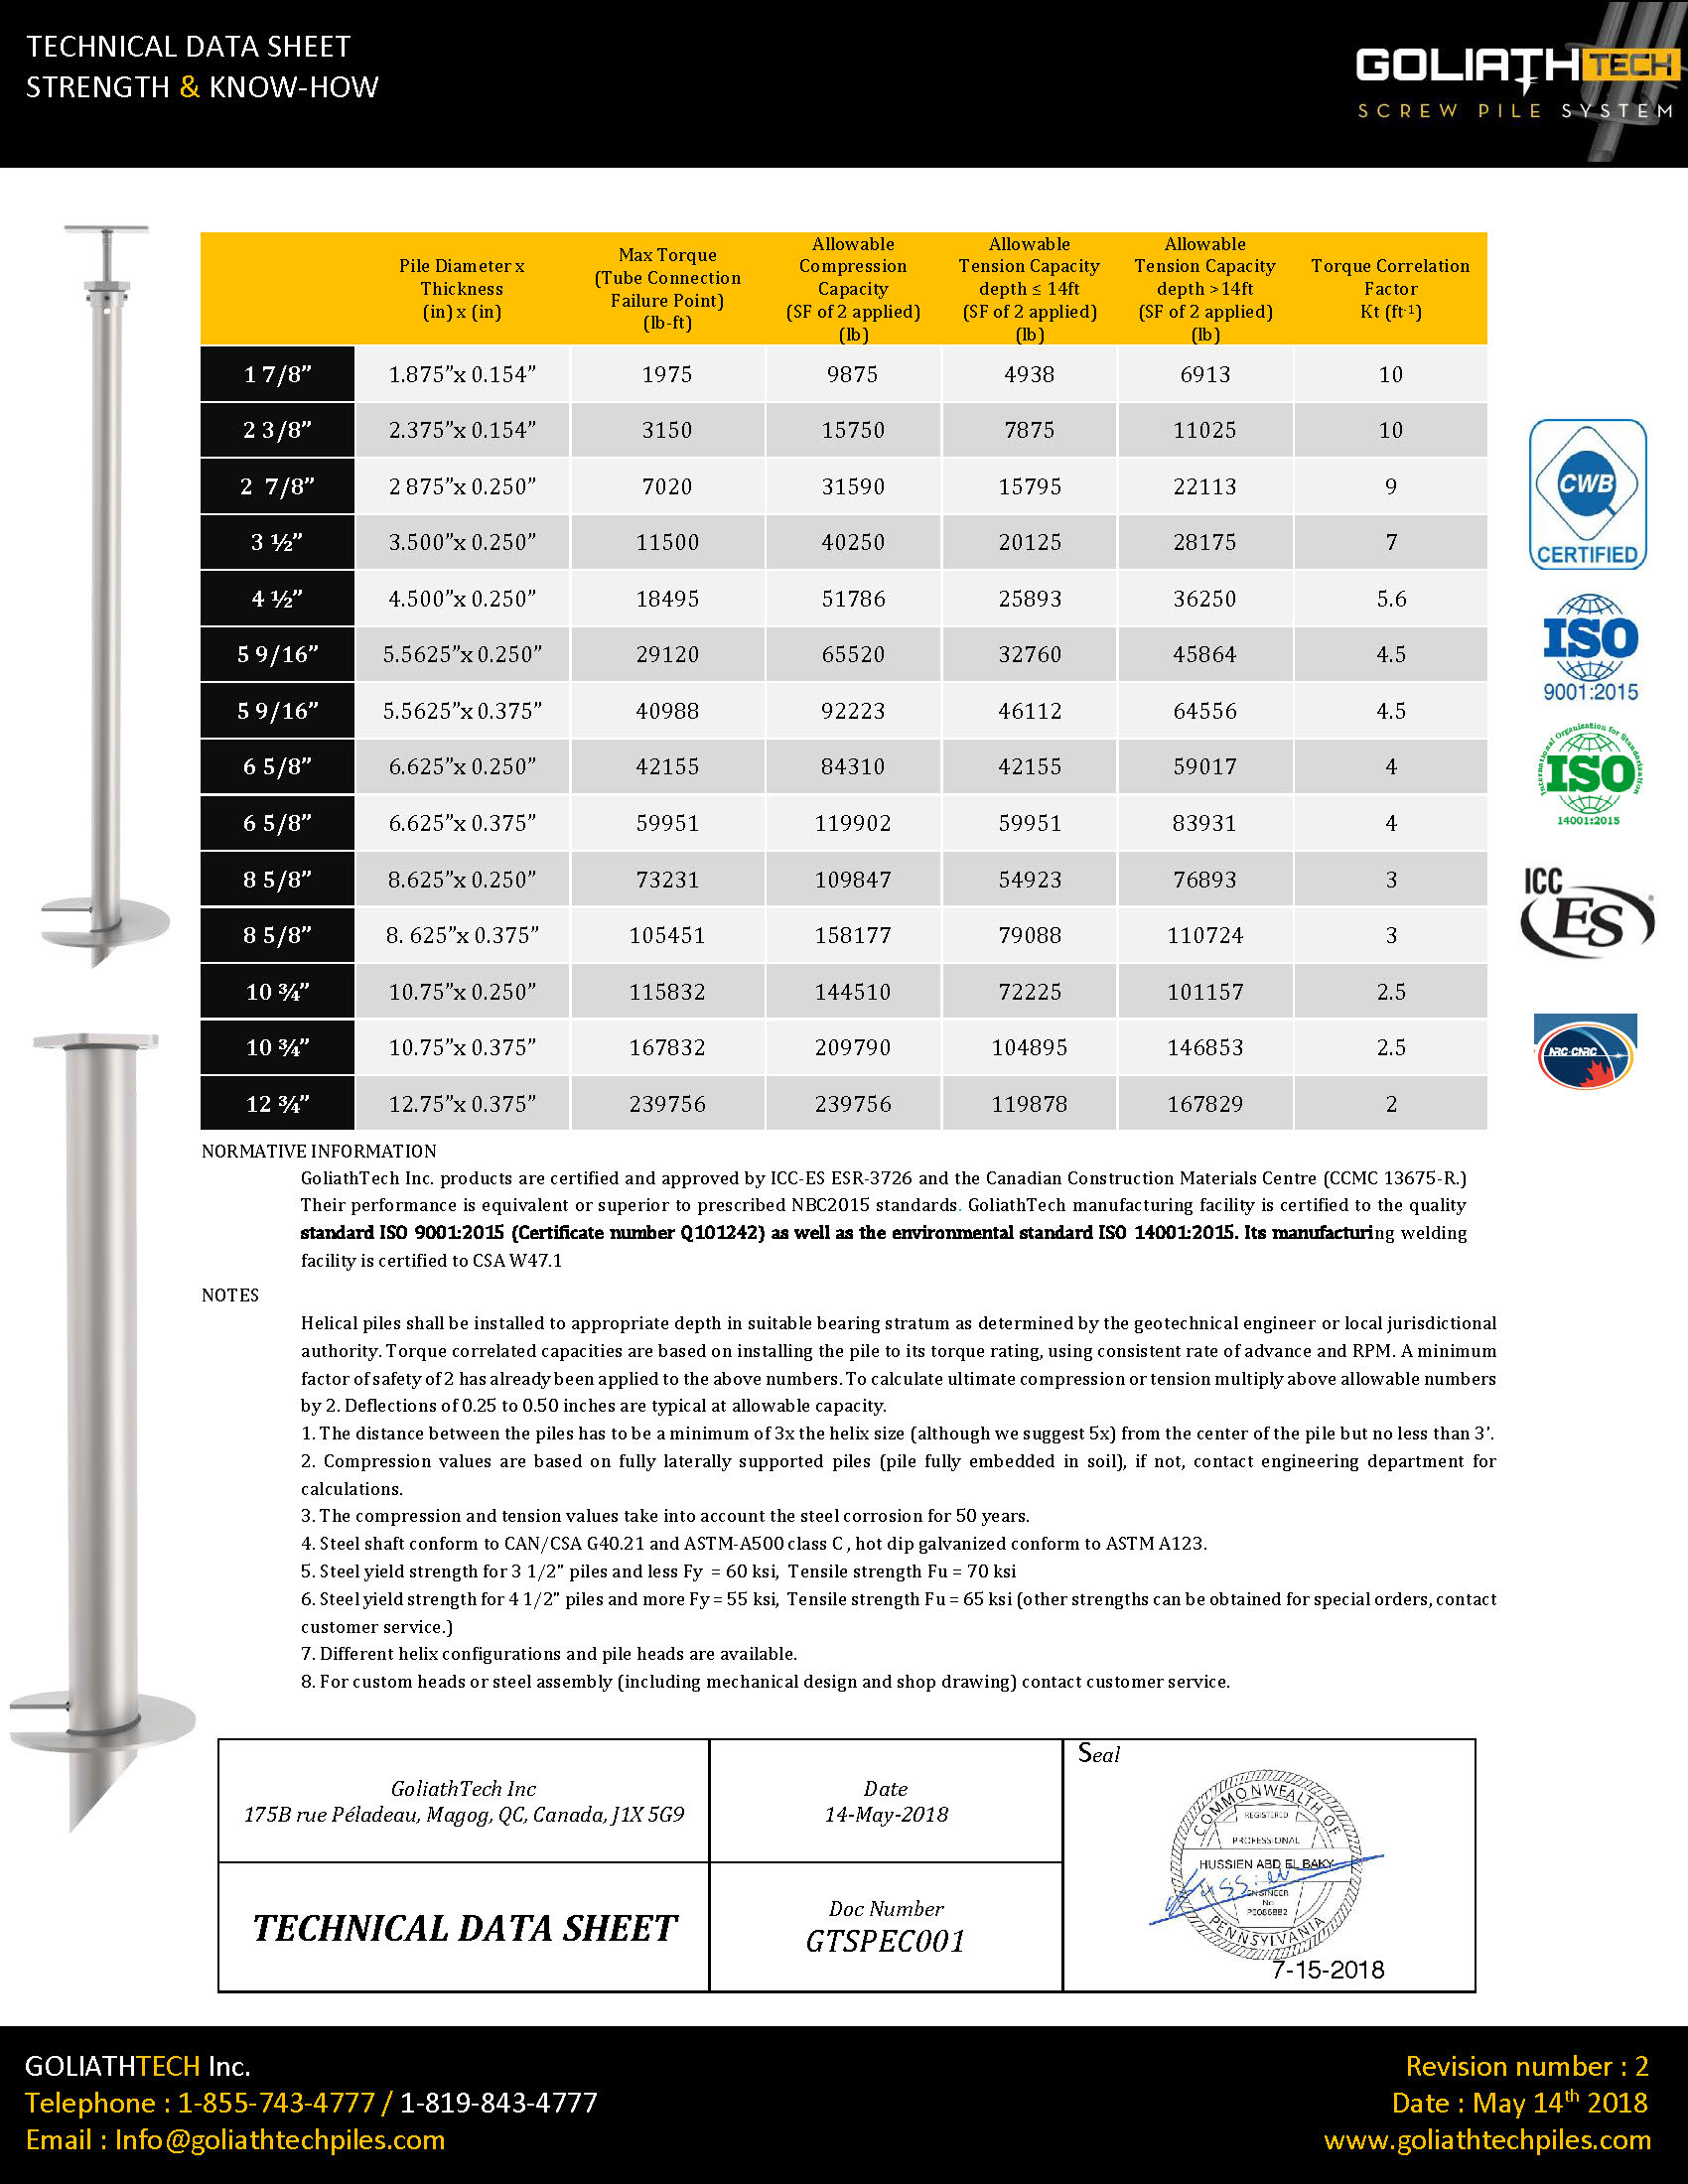 GoliathTech-Technical-Data-Sheet-US-PA.png